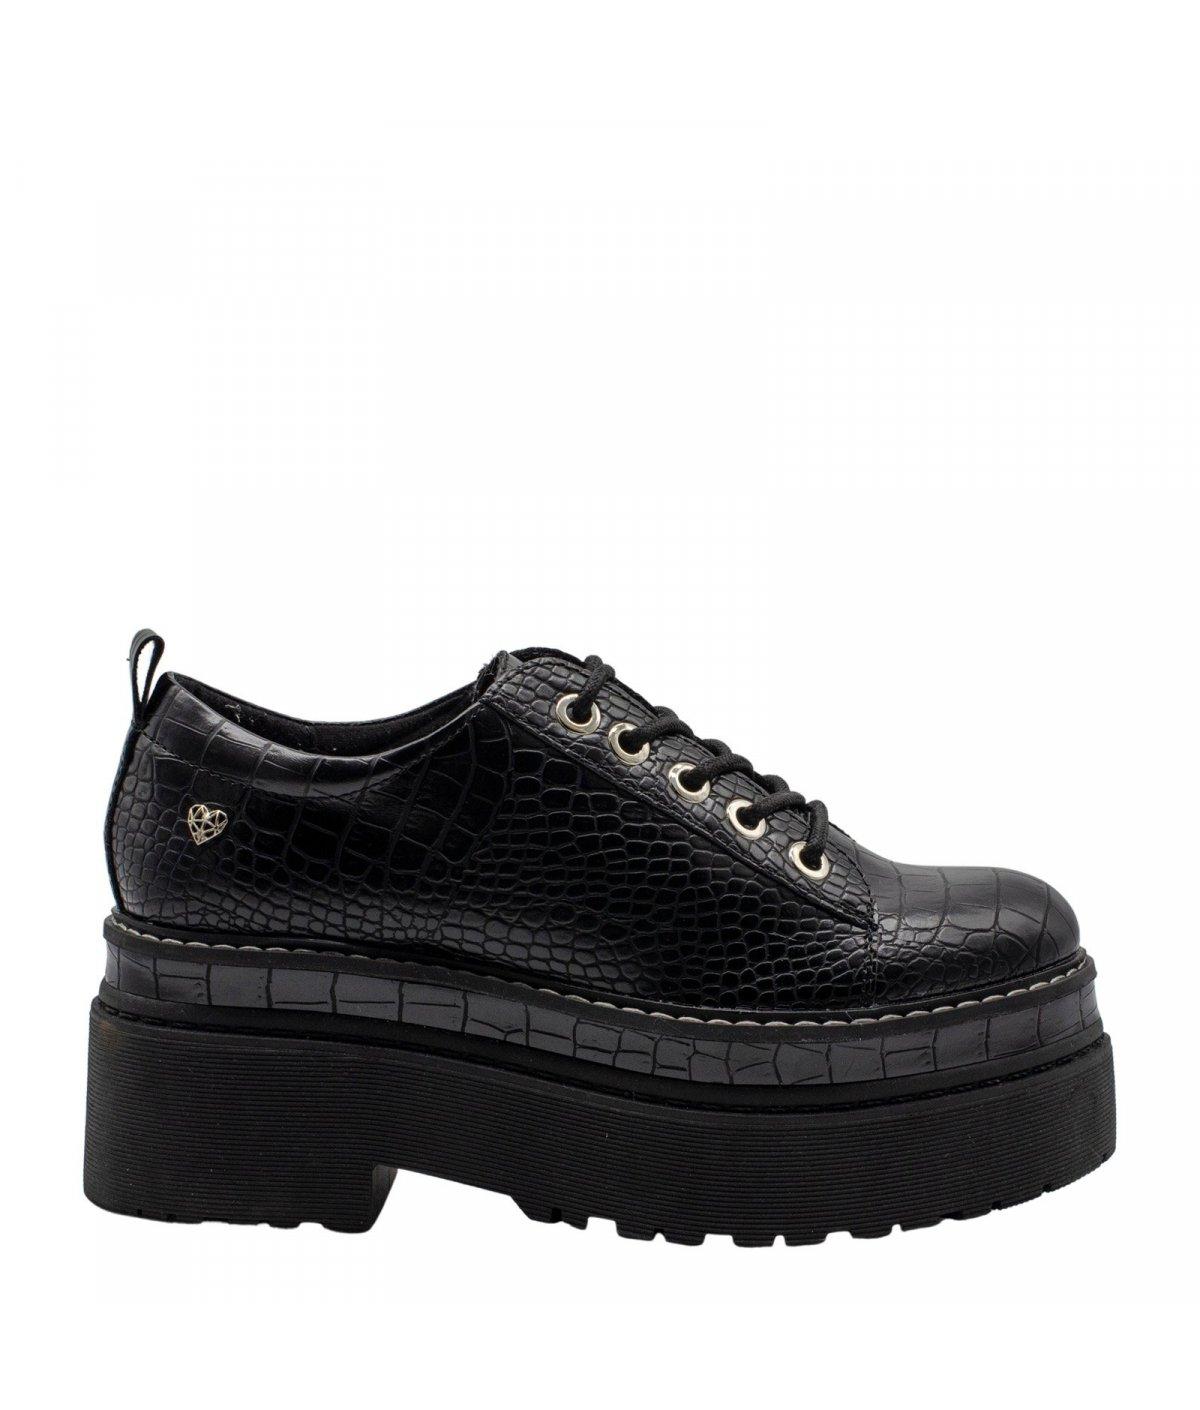 Zapaton Mujer 281 Richato